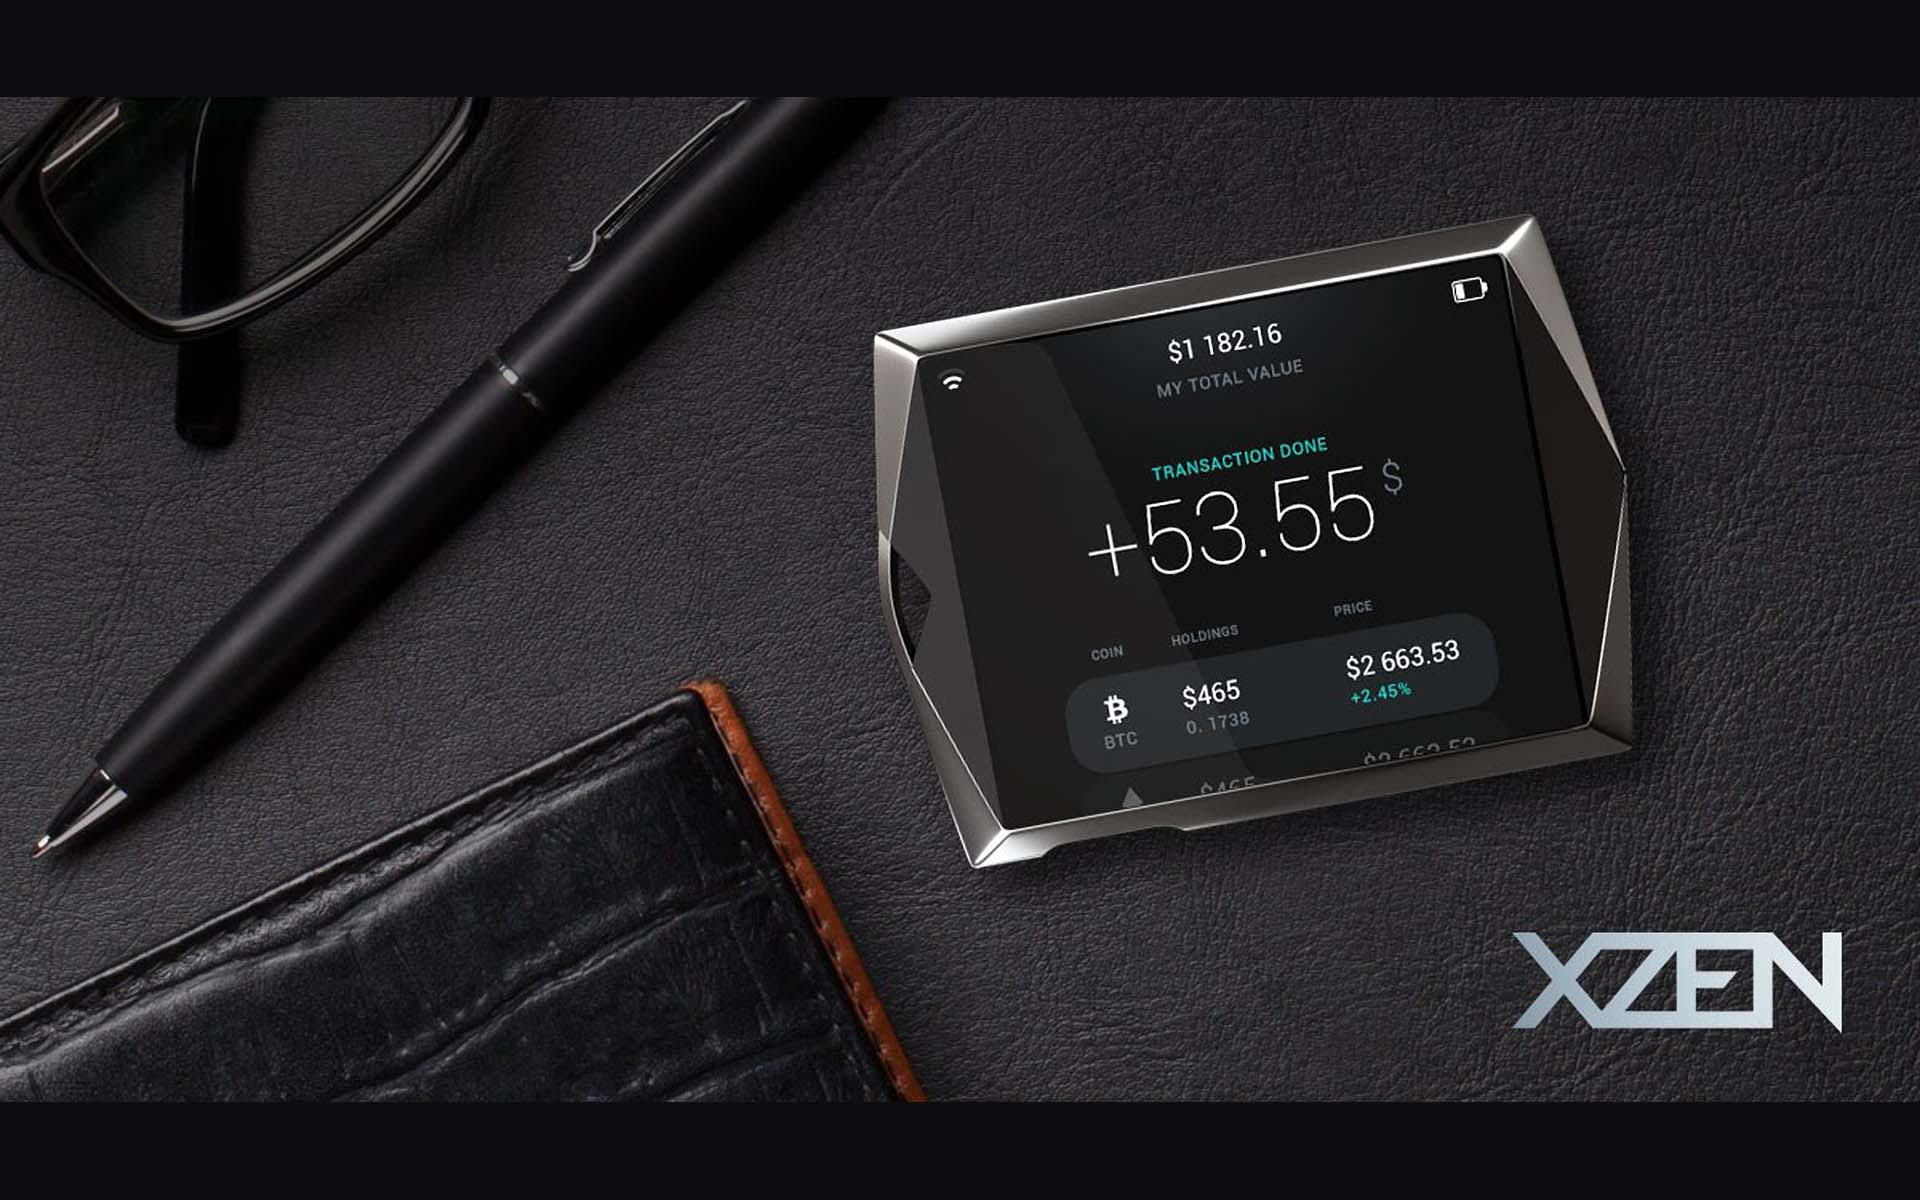 Startup XZEN Presents a Next-Generation Hardware Crypto Wallet